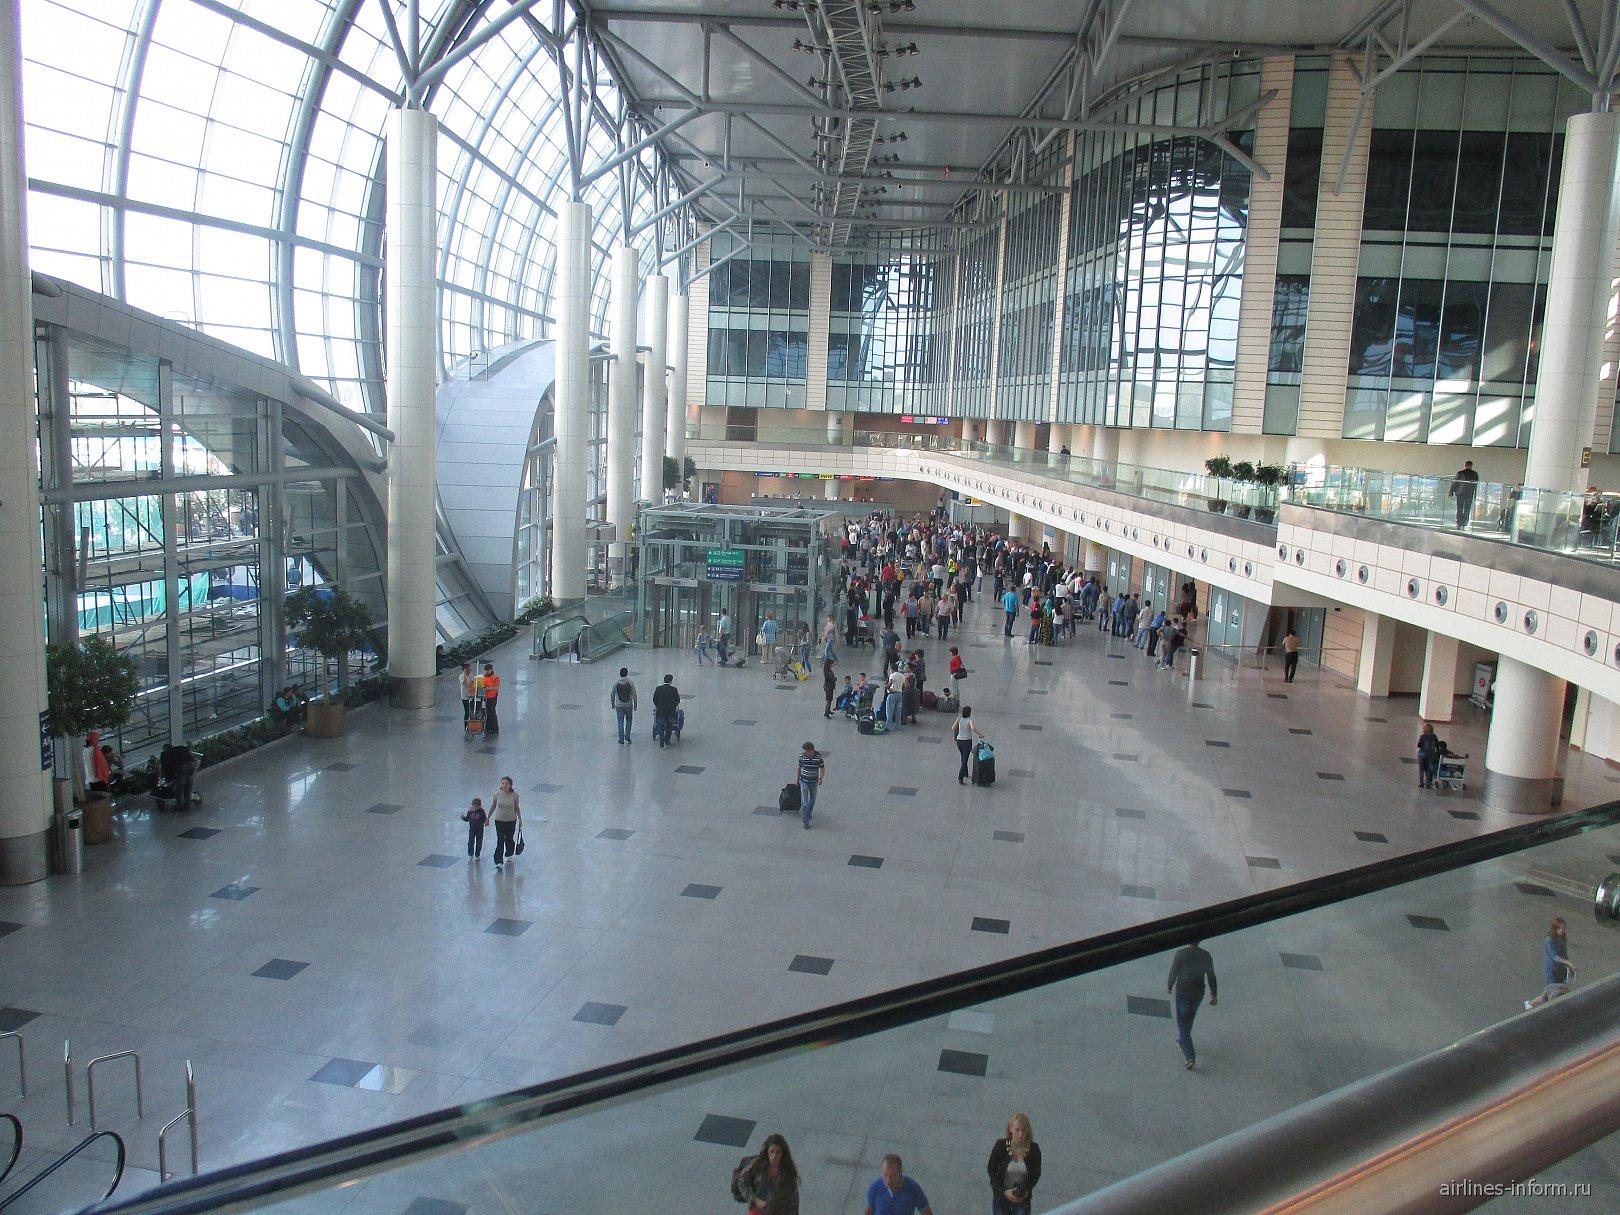 Зал прилета в аэропорту Москва Домодедово